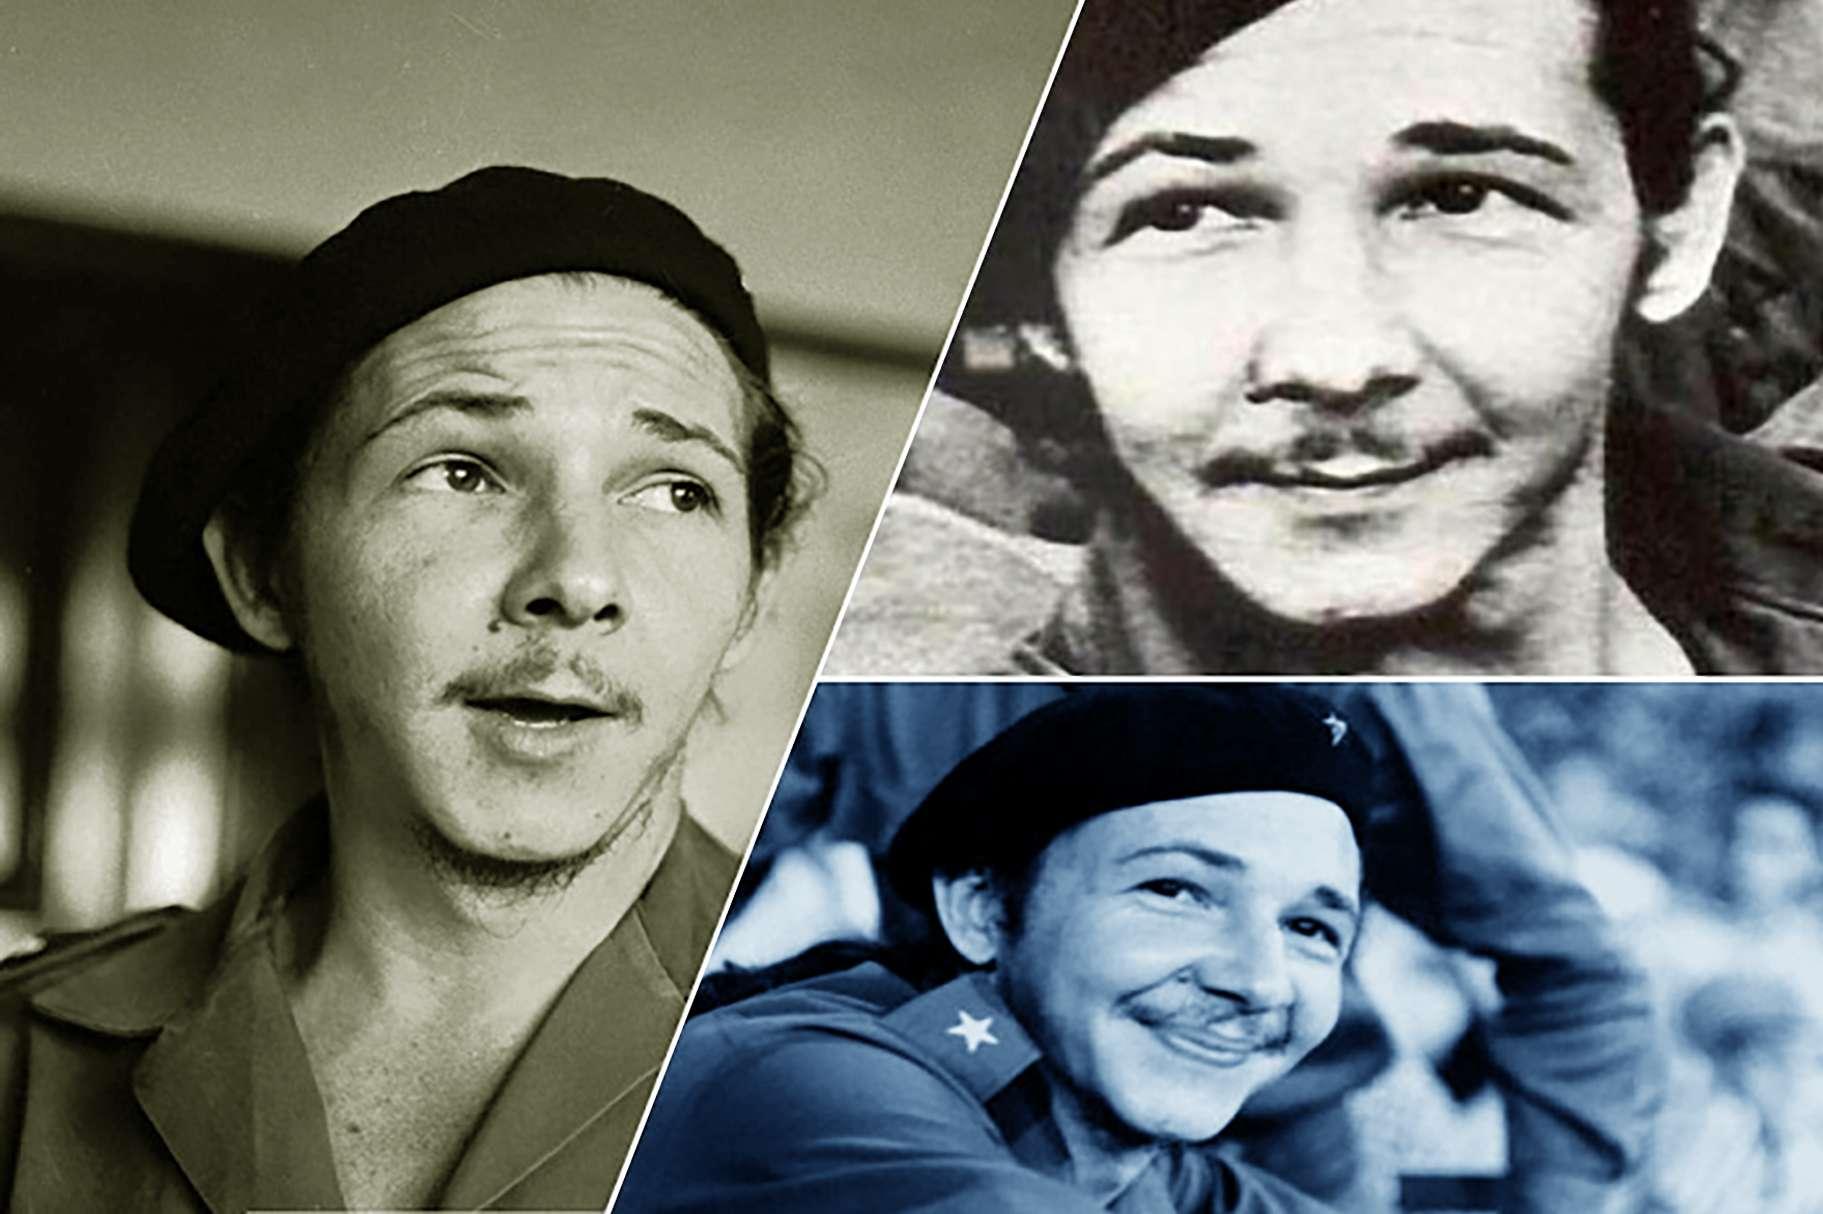 Raúl Castro Ruz - Ραούλ Κάστρο Ρουζ